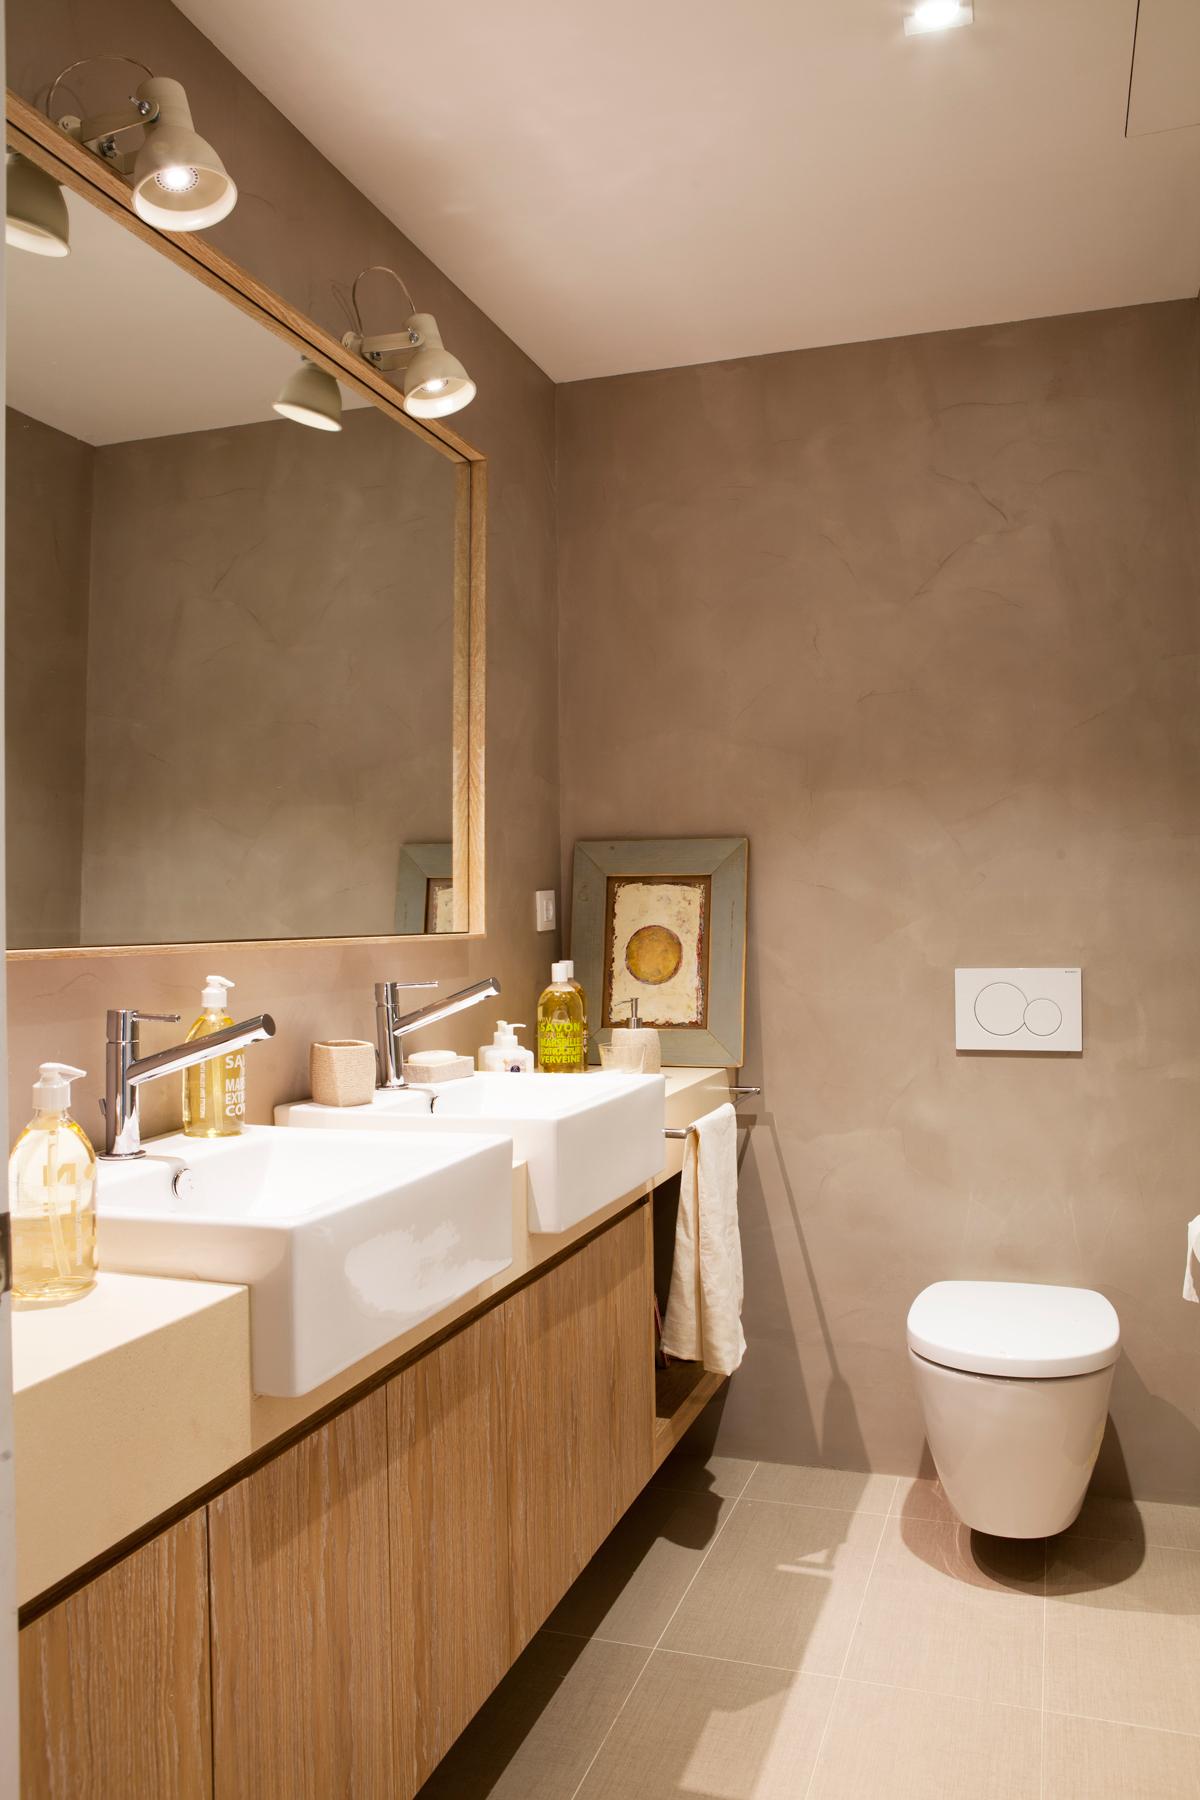 Un lavamanos para cada ba o for Idea de muebles quedarse